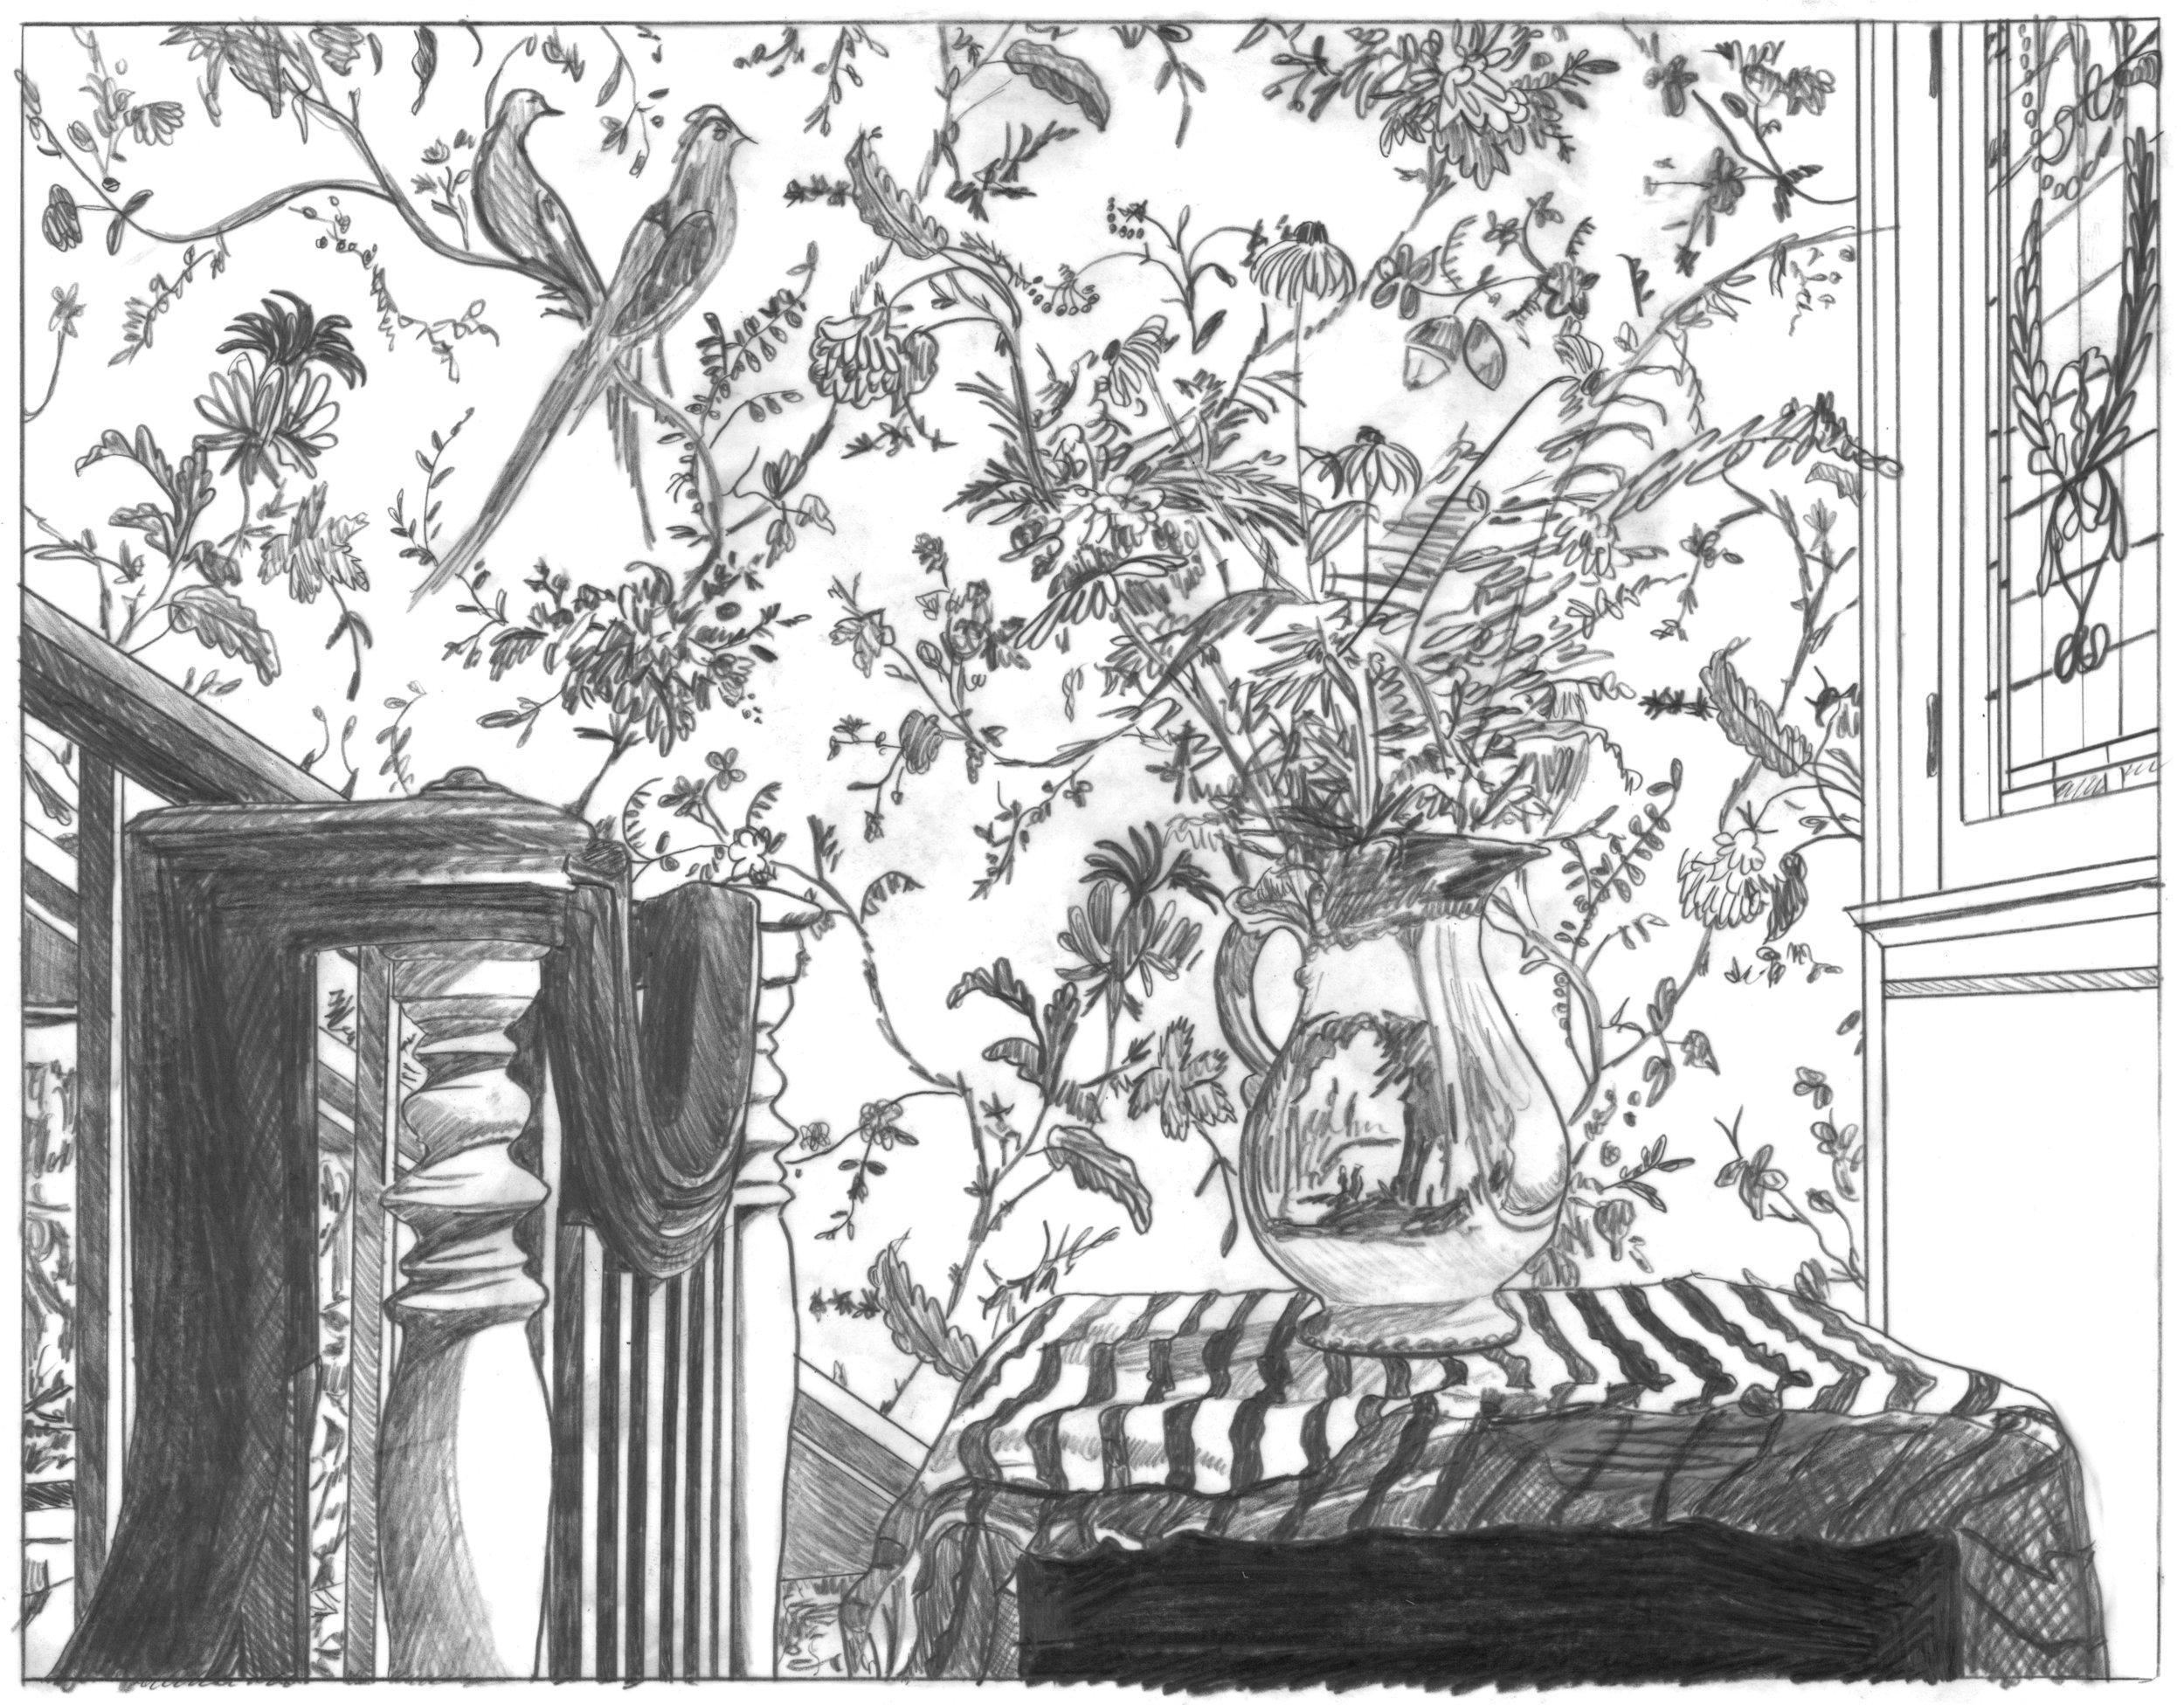 Nest/Domestic Bliss (graphite)